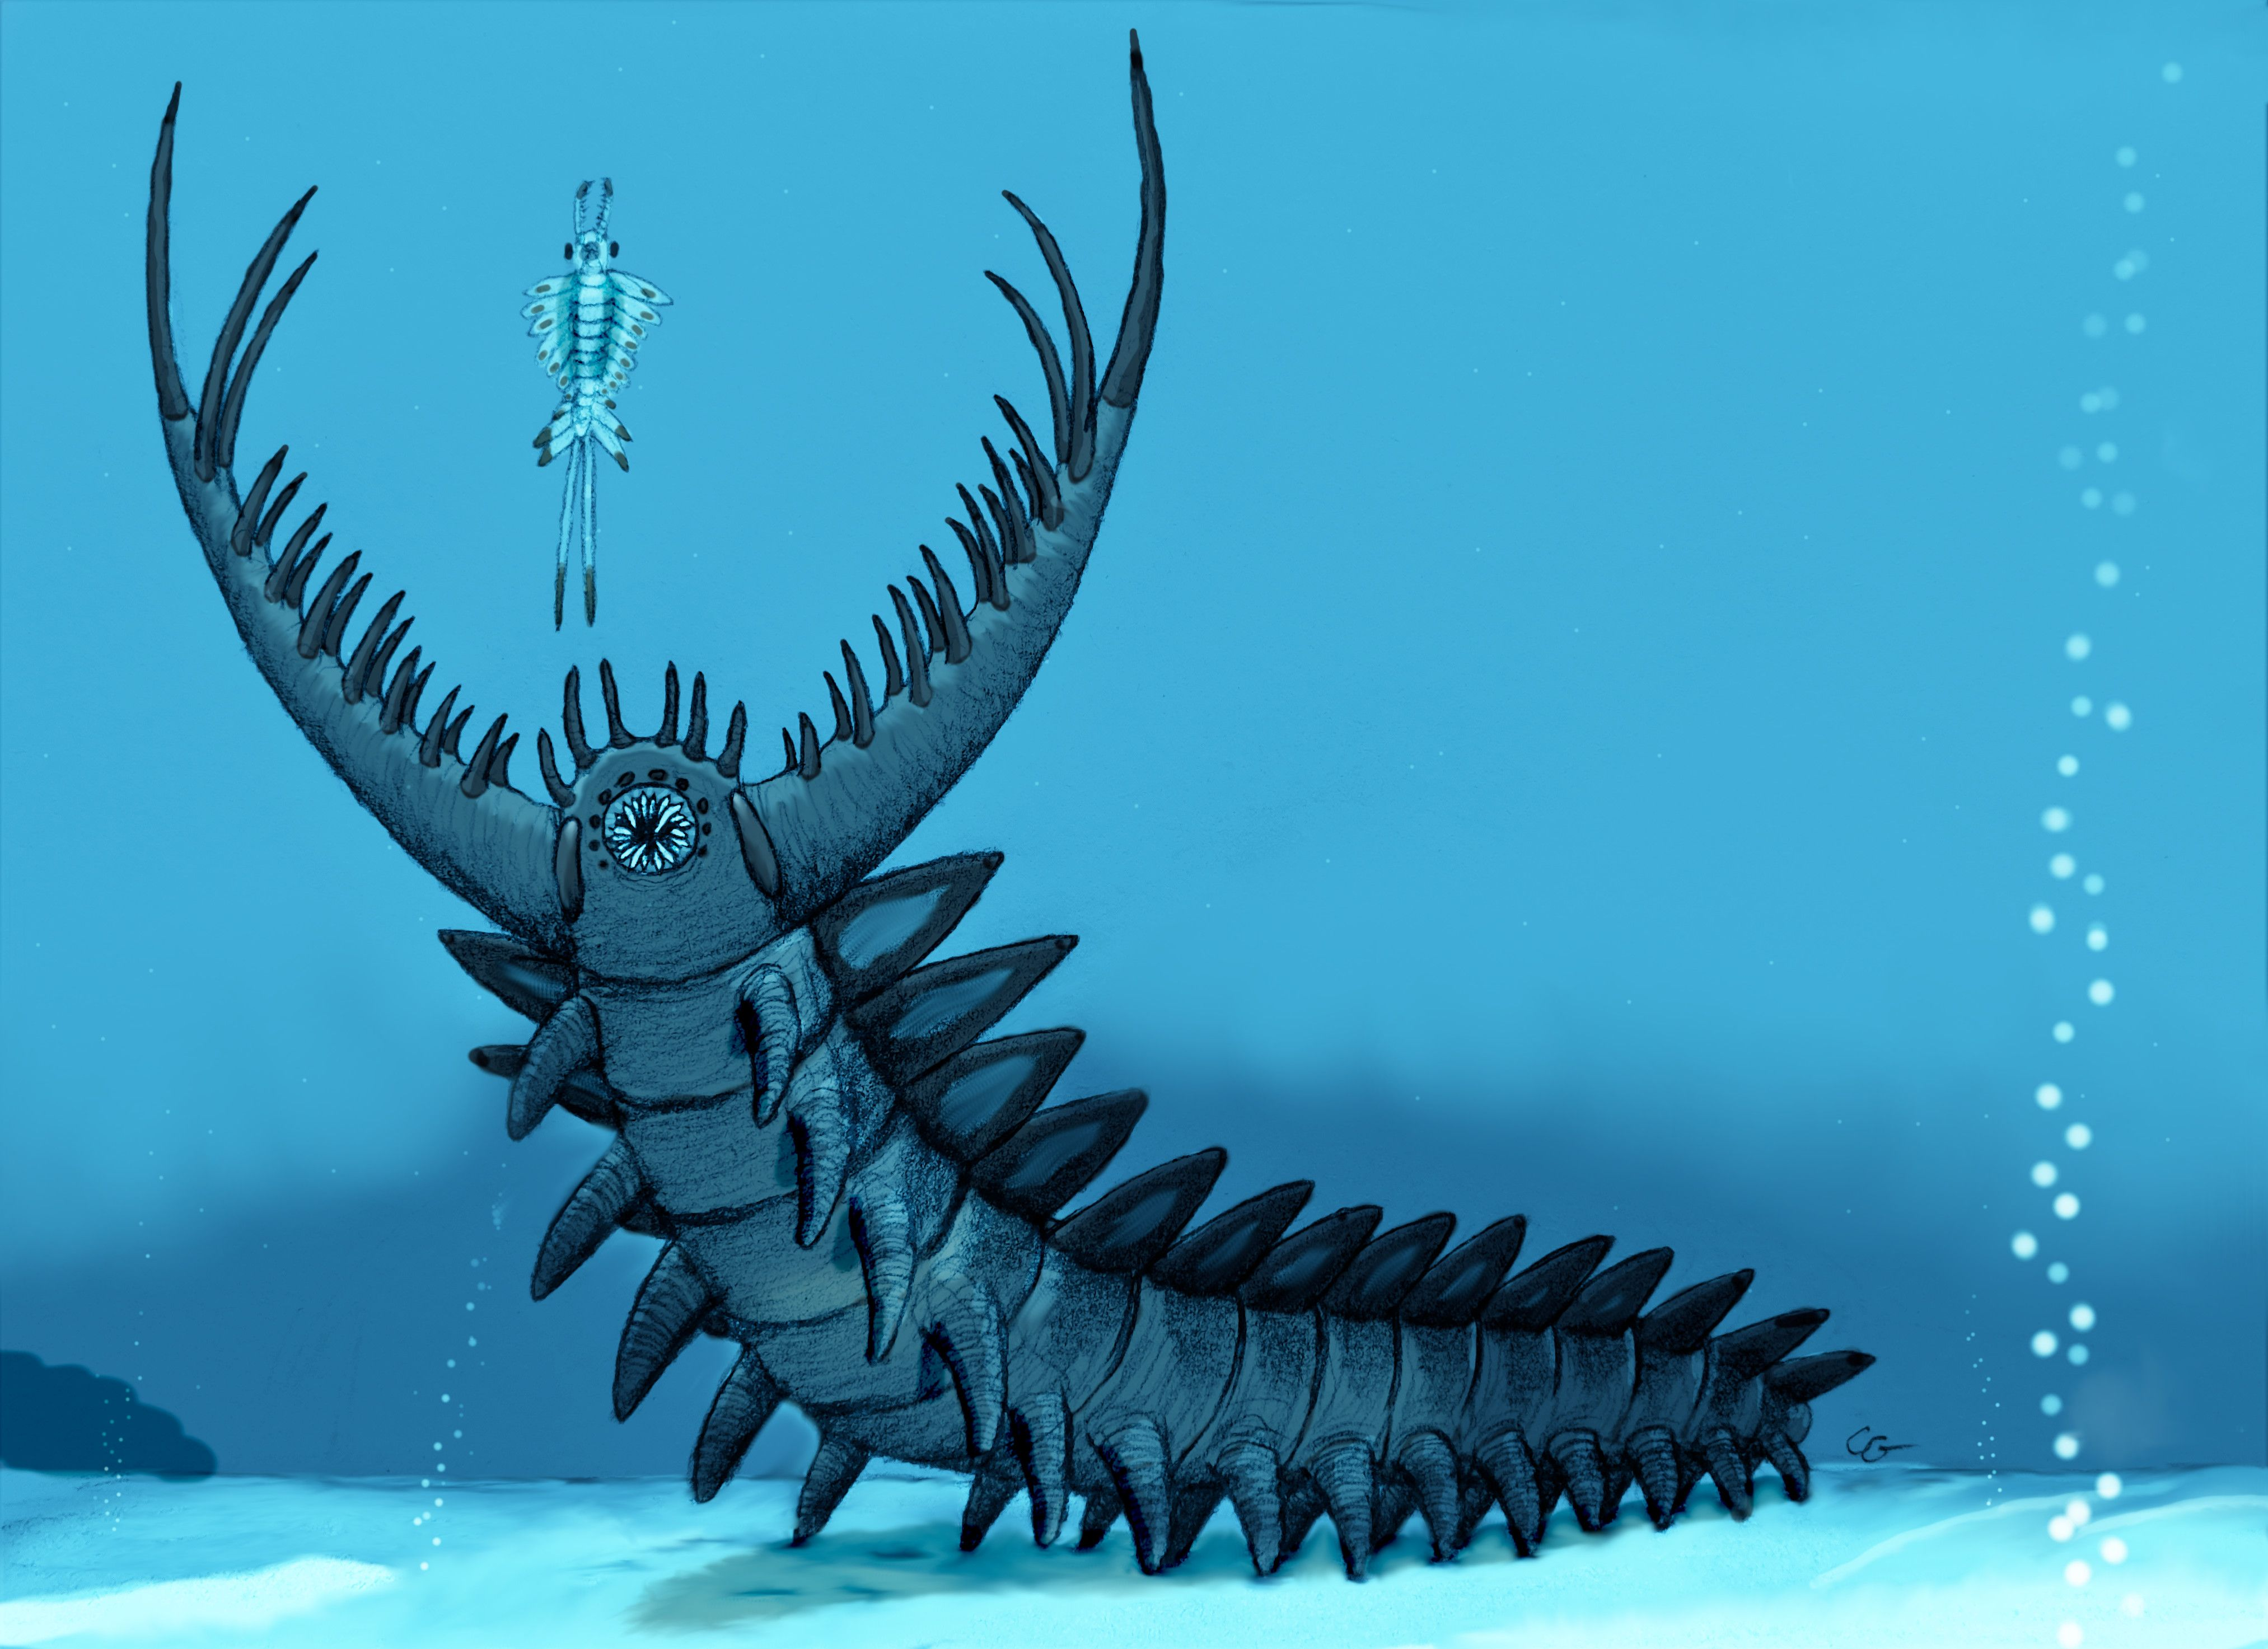 Omnidens amplus by AcroSauroTaurus on DeviantArt in 2021 | Prehistoric  animals, Paleontology, Prehistoric